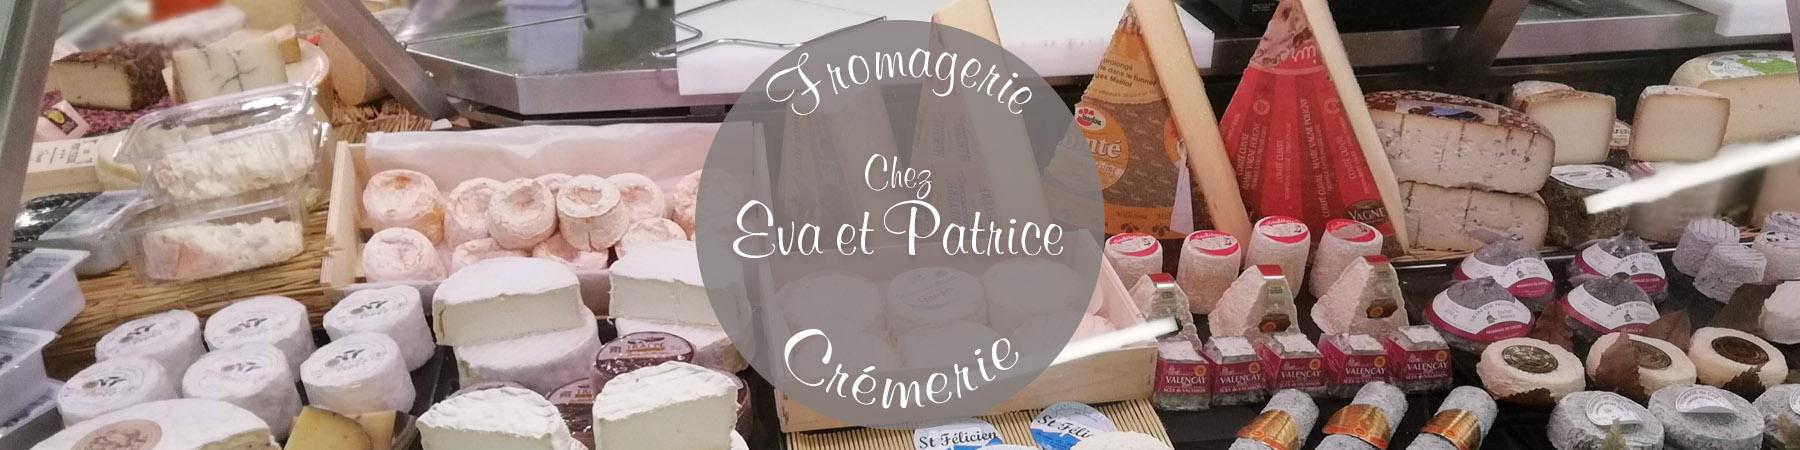 Fromagerie Chez Eva et Patrice